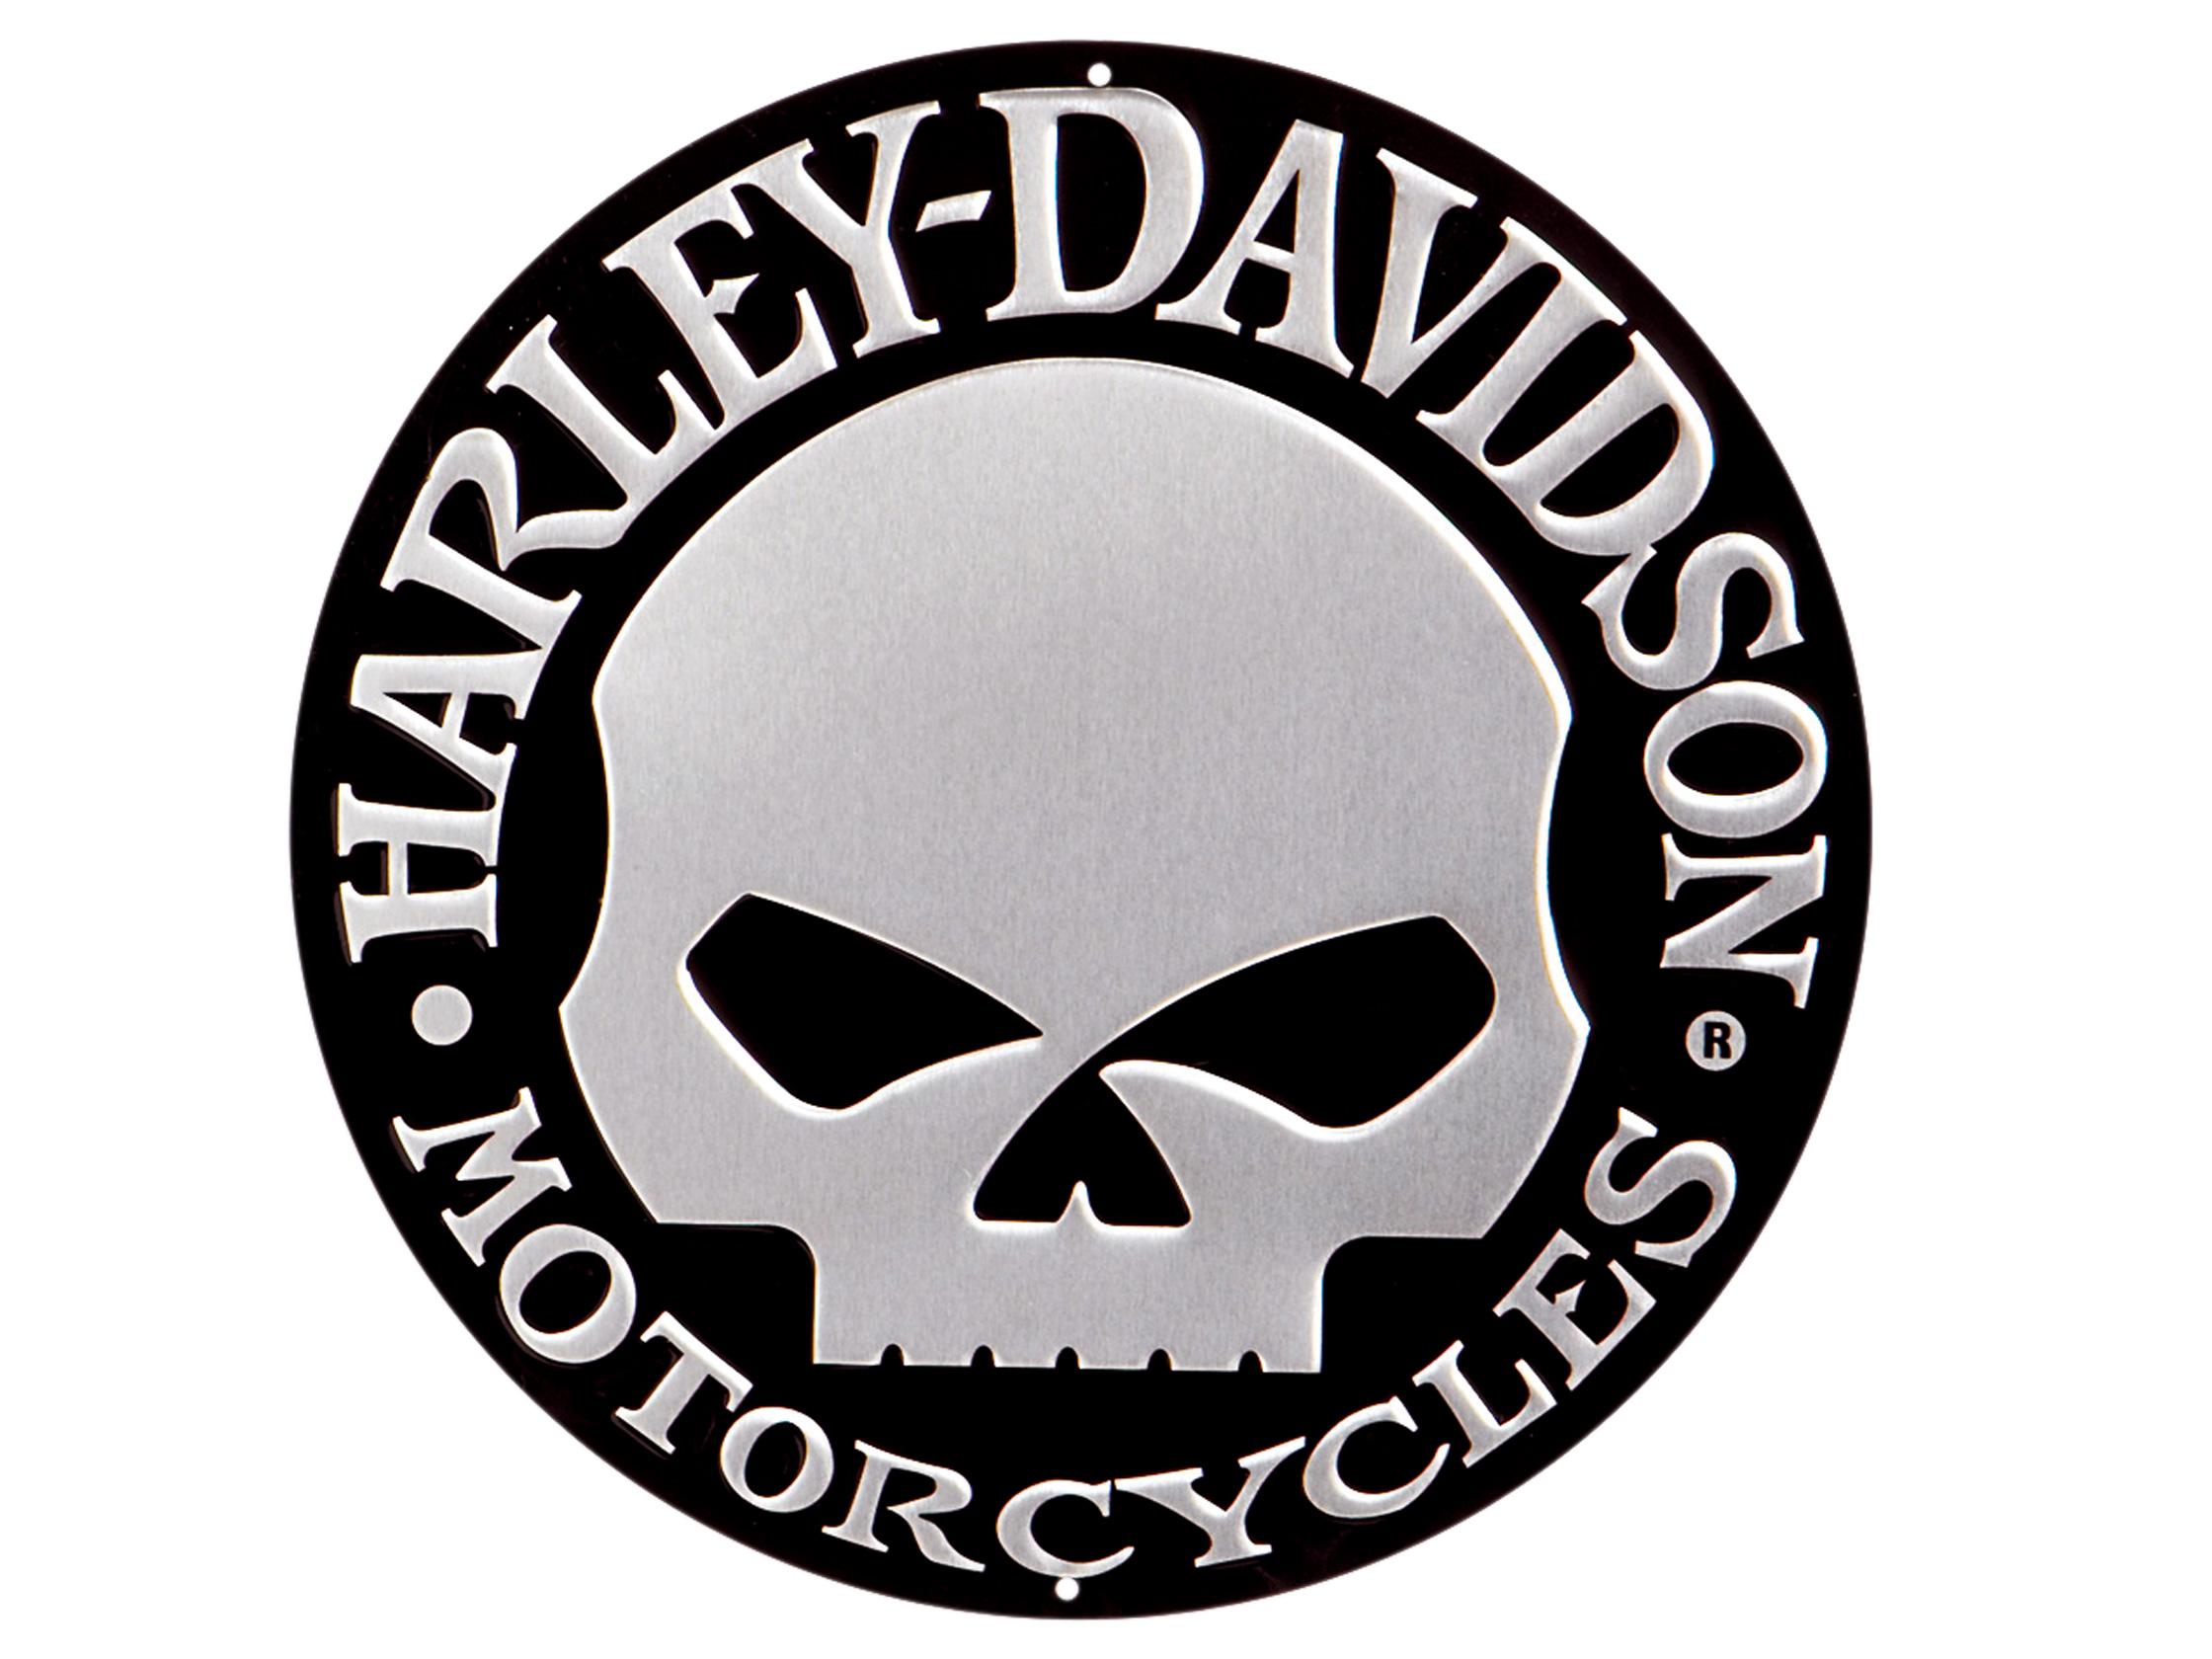 Clip Art Harley Davidson Logo - ClipArt Best